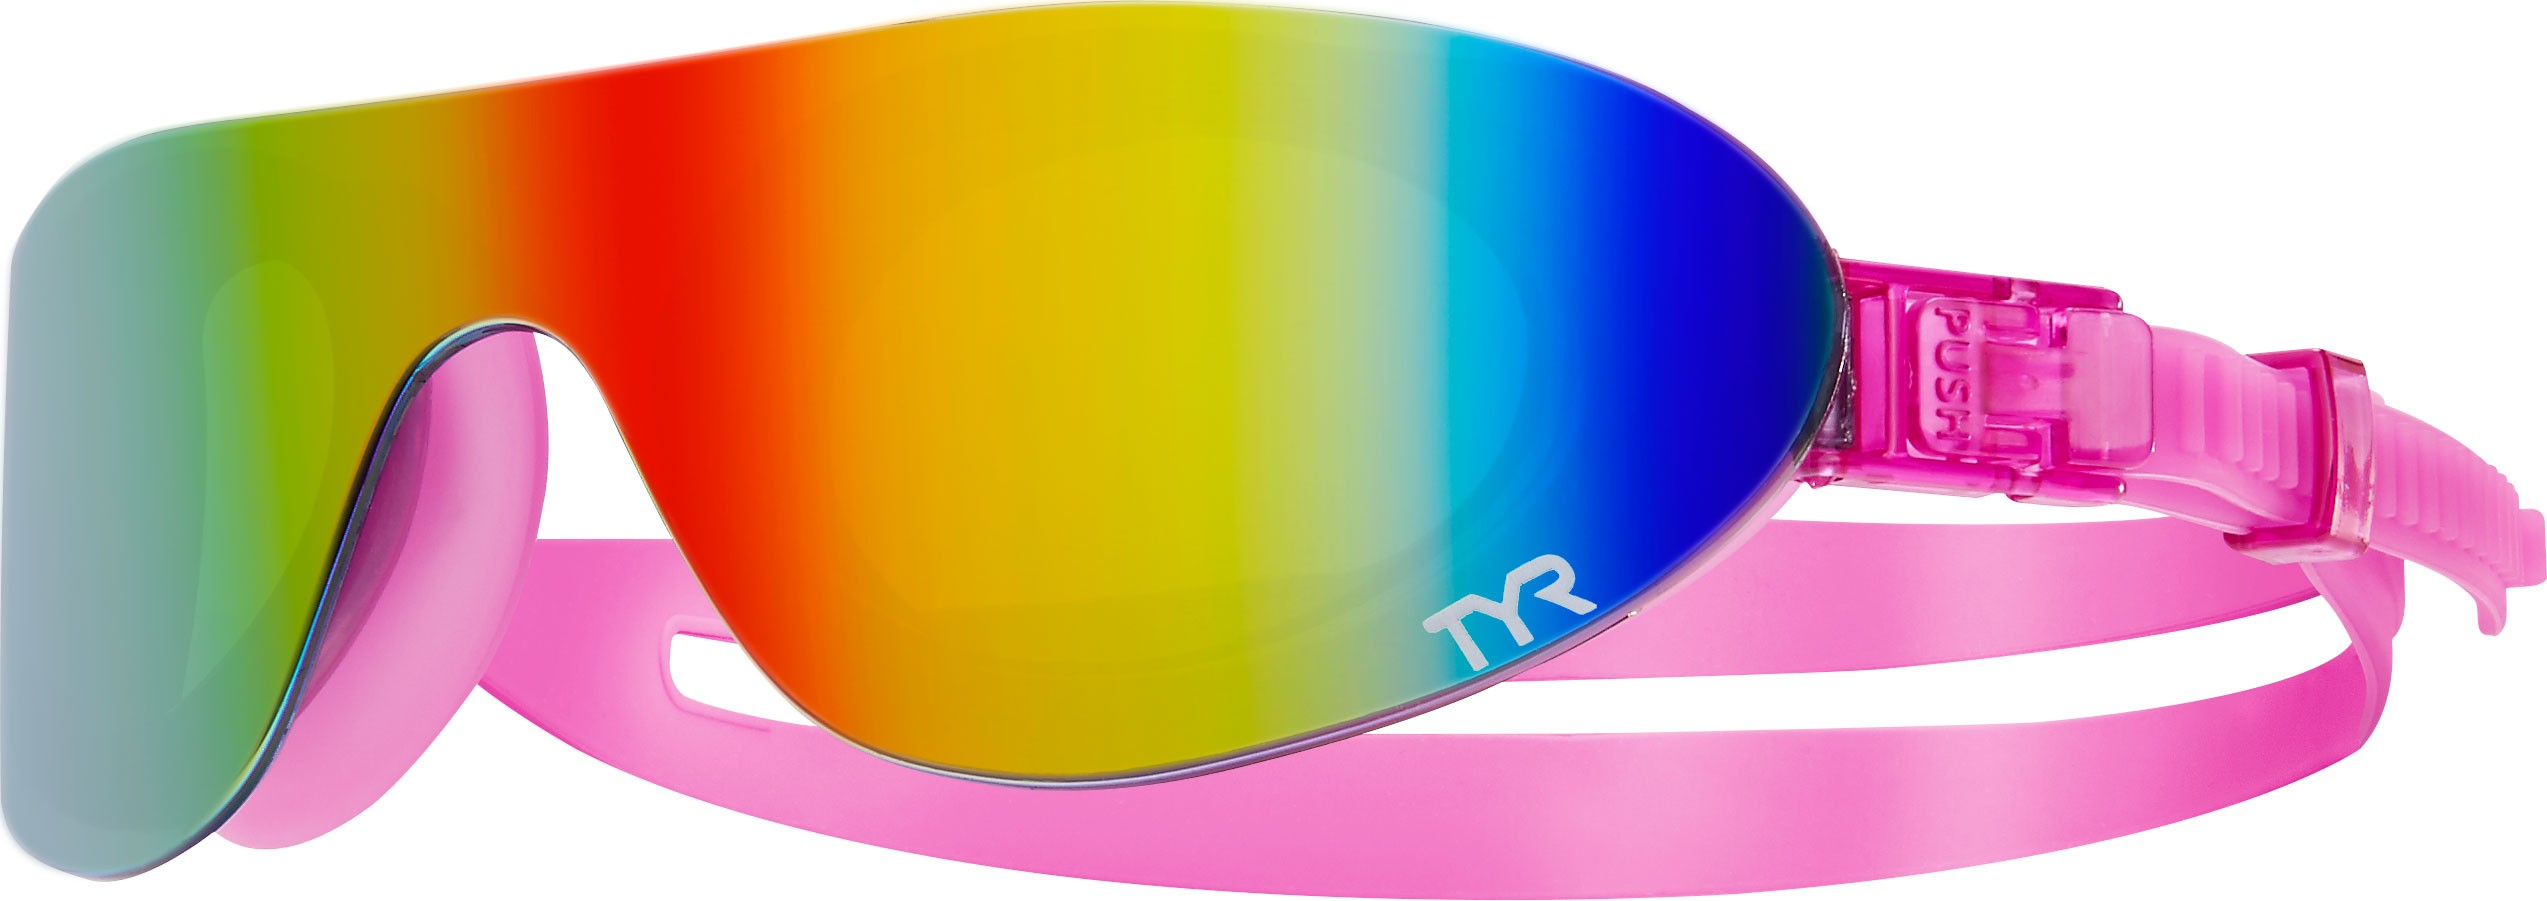 92c55577e5e TYR Swimshades Mirrored Adult Goggles